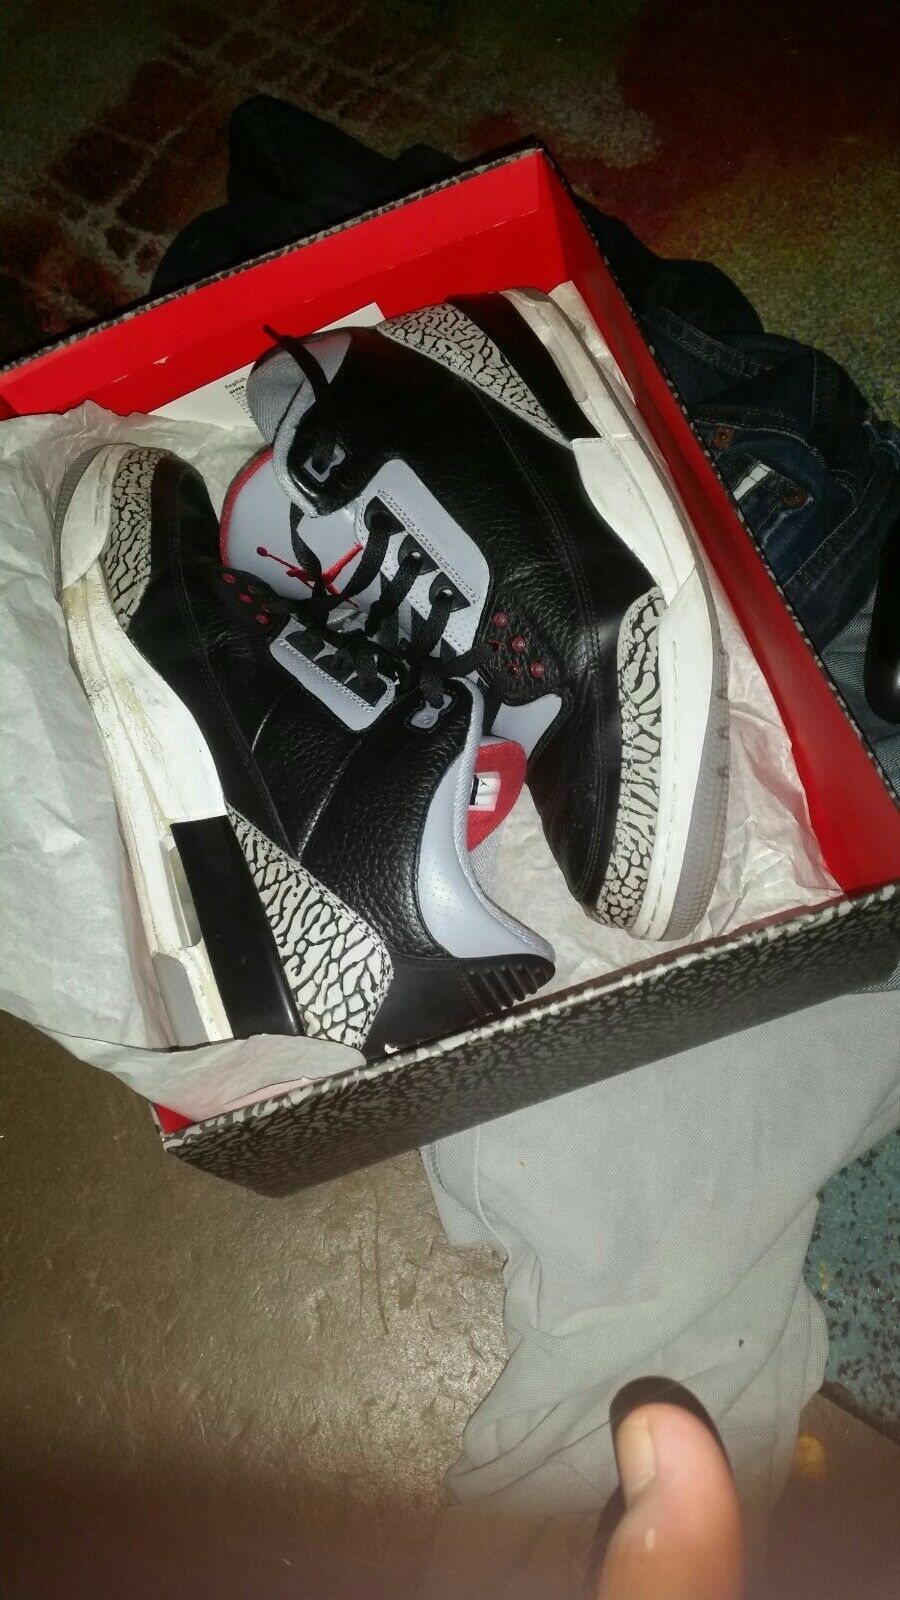 Nike Air Jordan III 3 Black Cement 2008 Schuhgrösse 46 wie neu